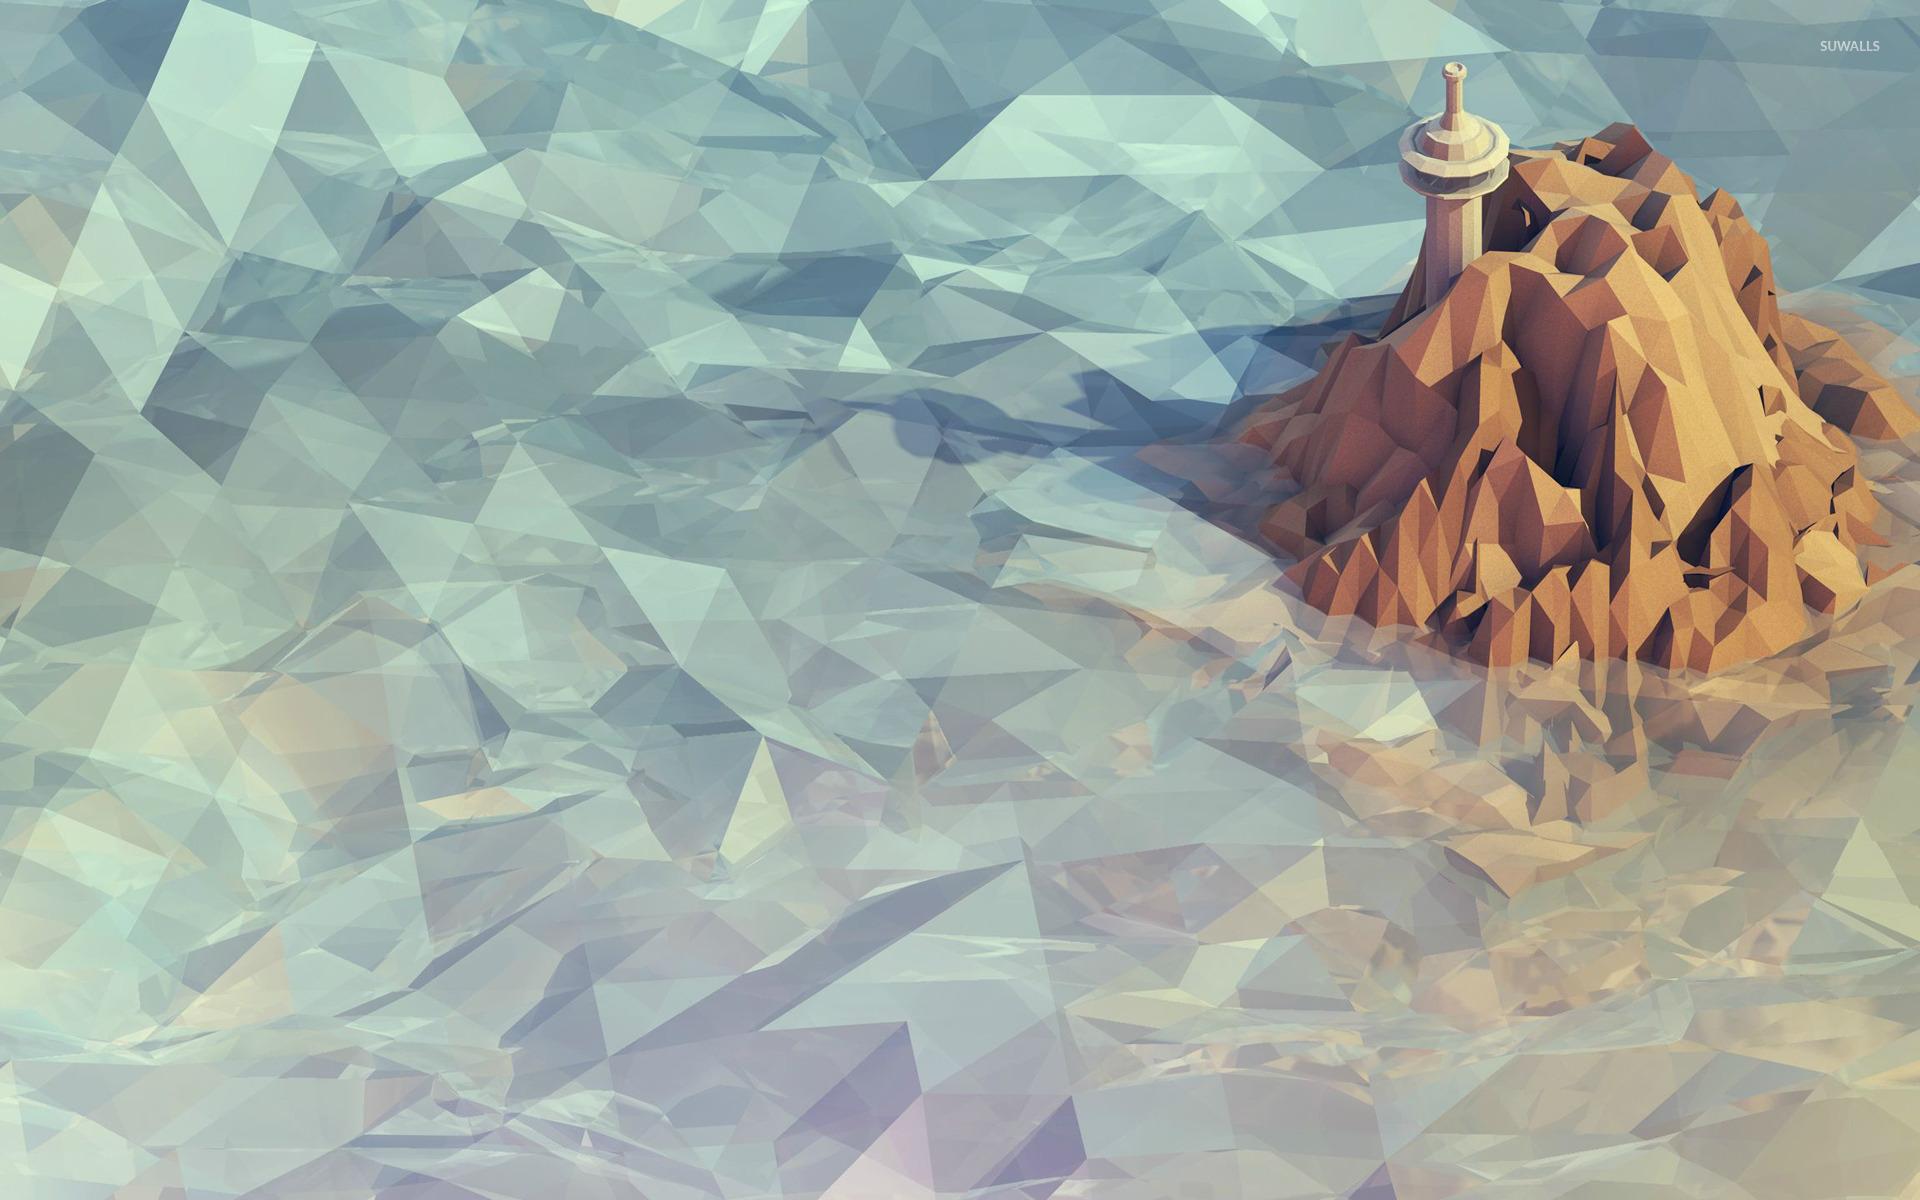 polygon mountain wallpaper - photo #25